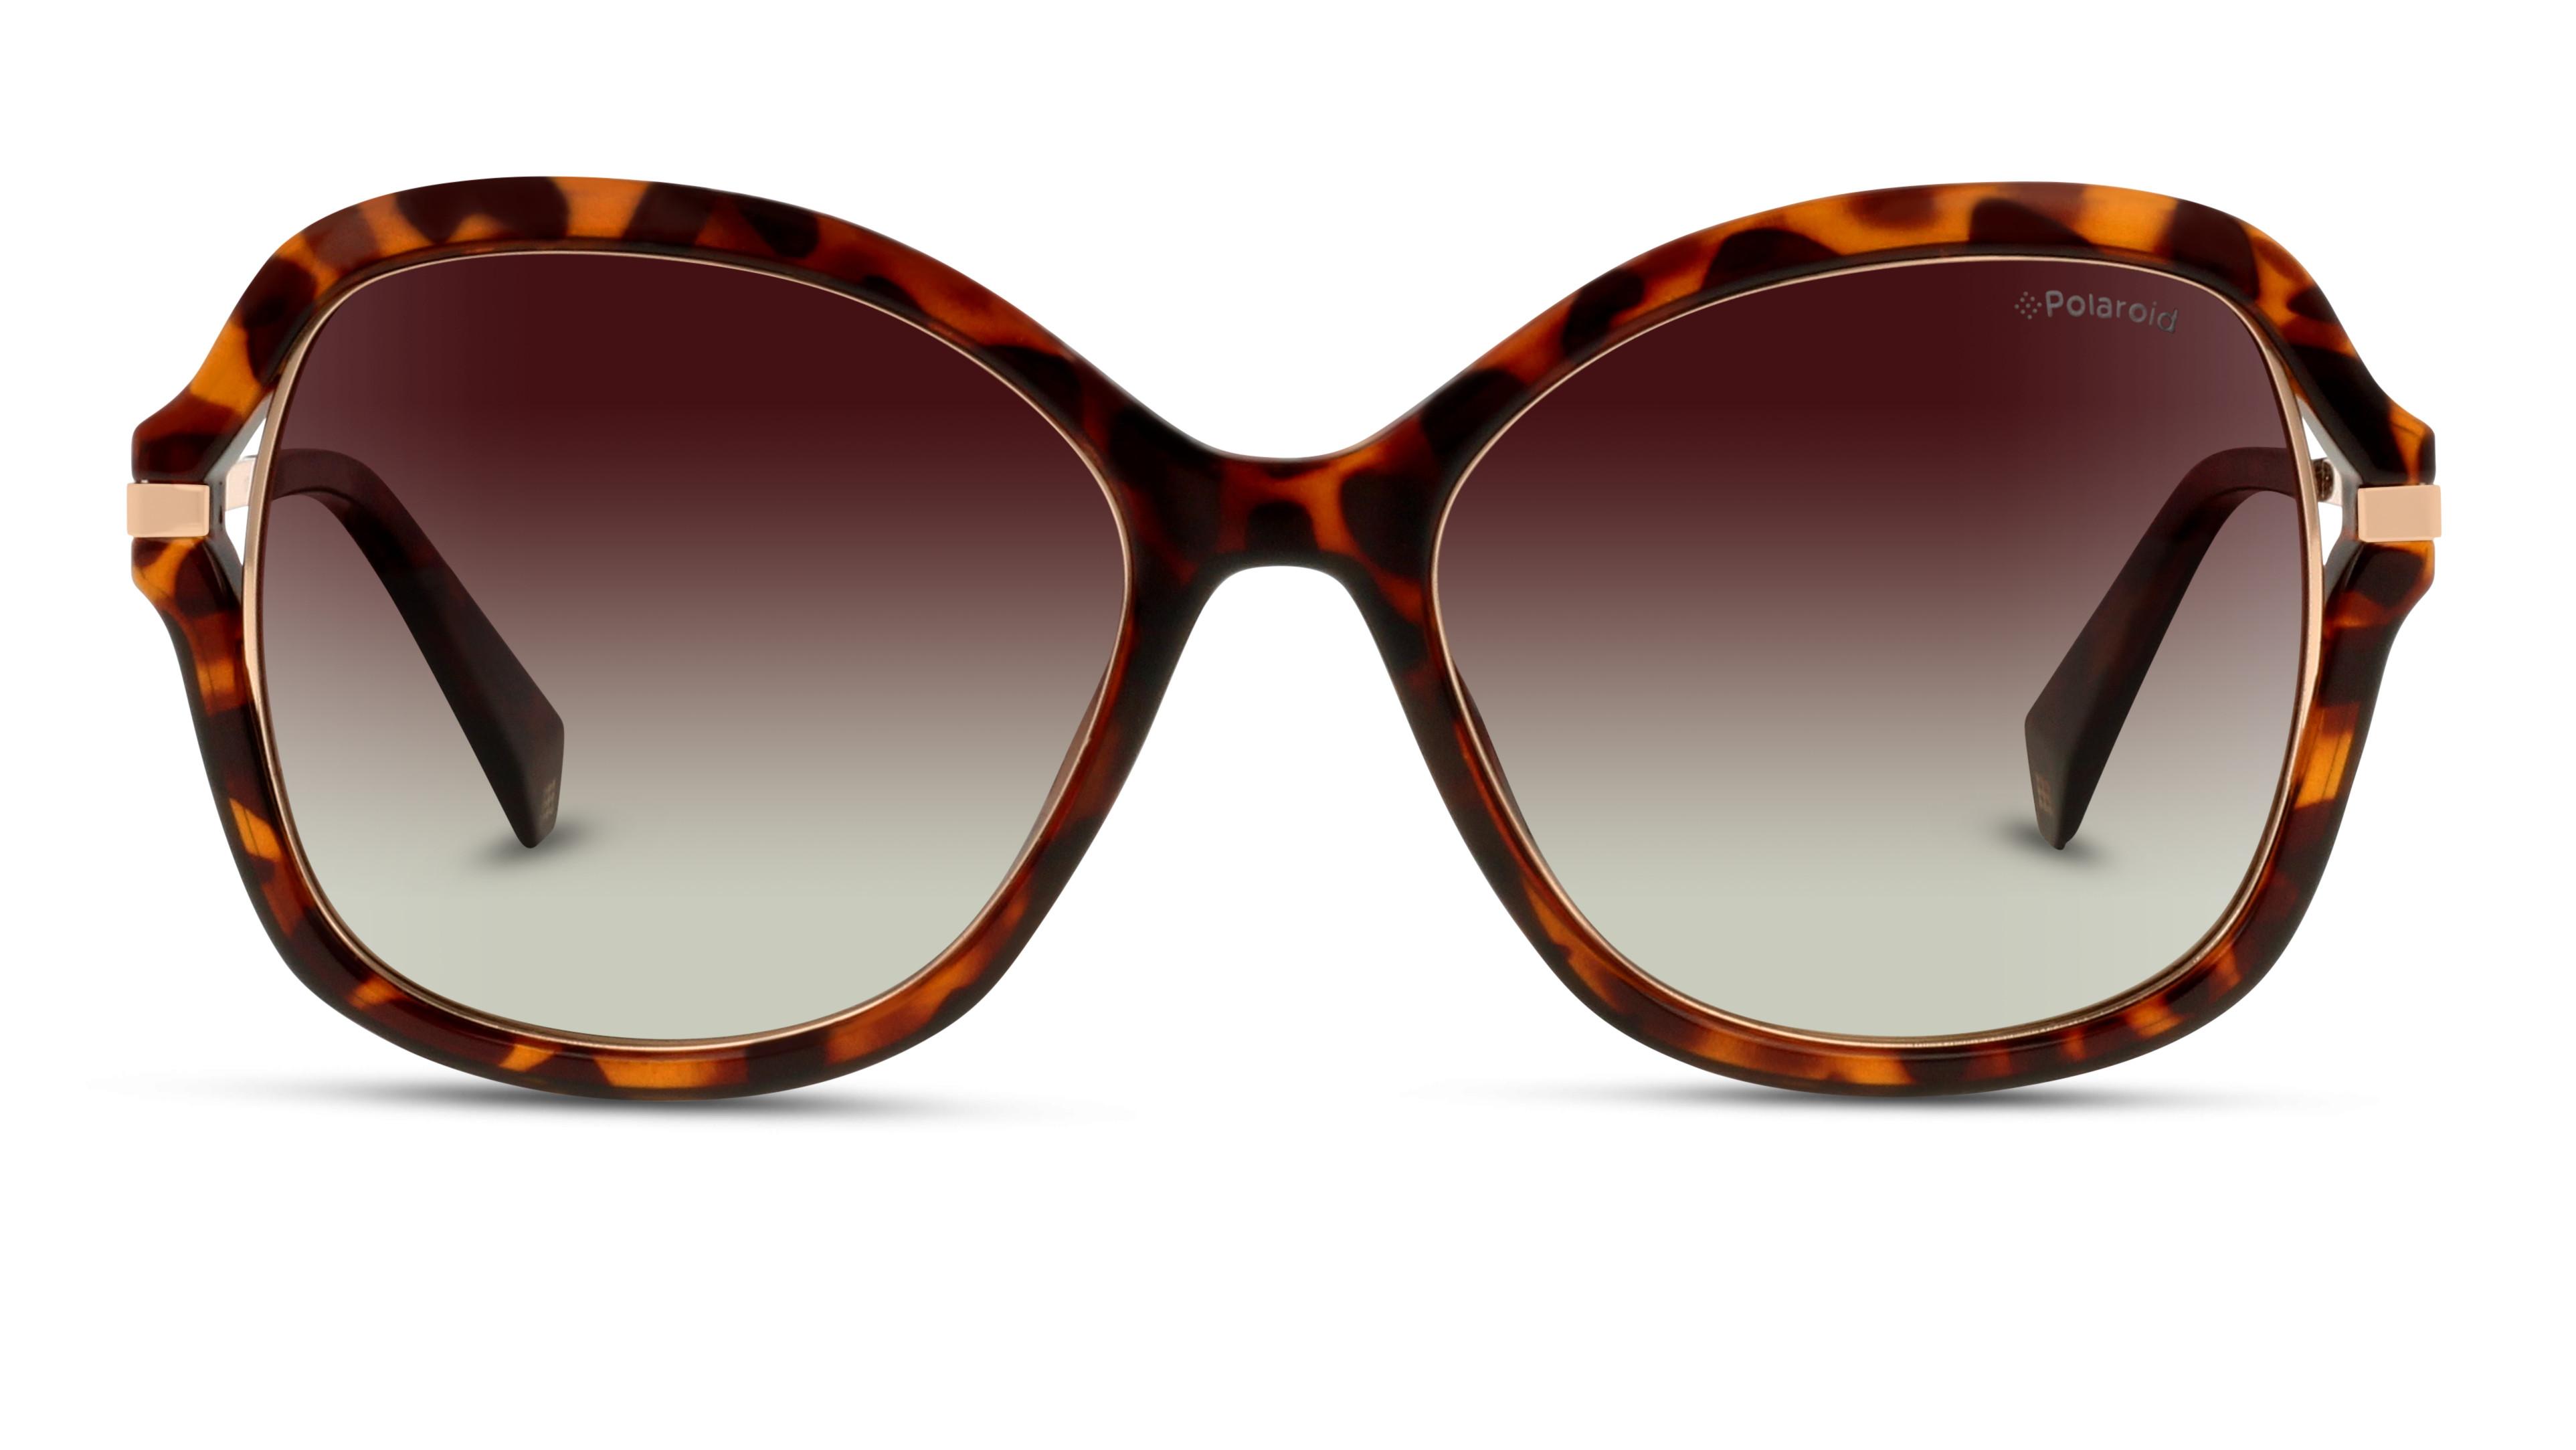 716736034966-front-01-polaroid-4068s-eyewear-dark-havana